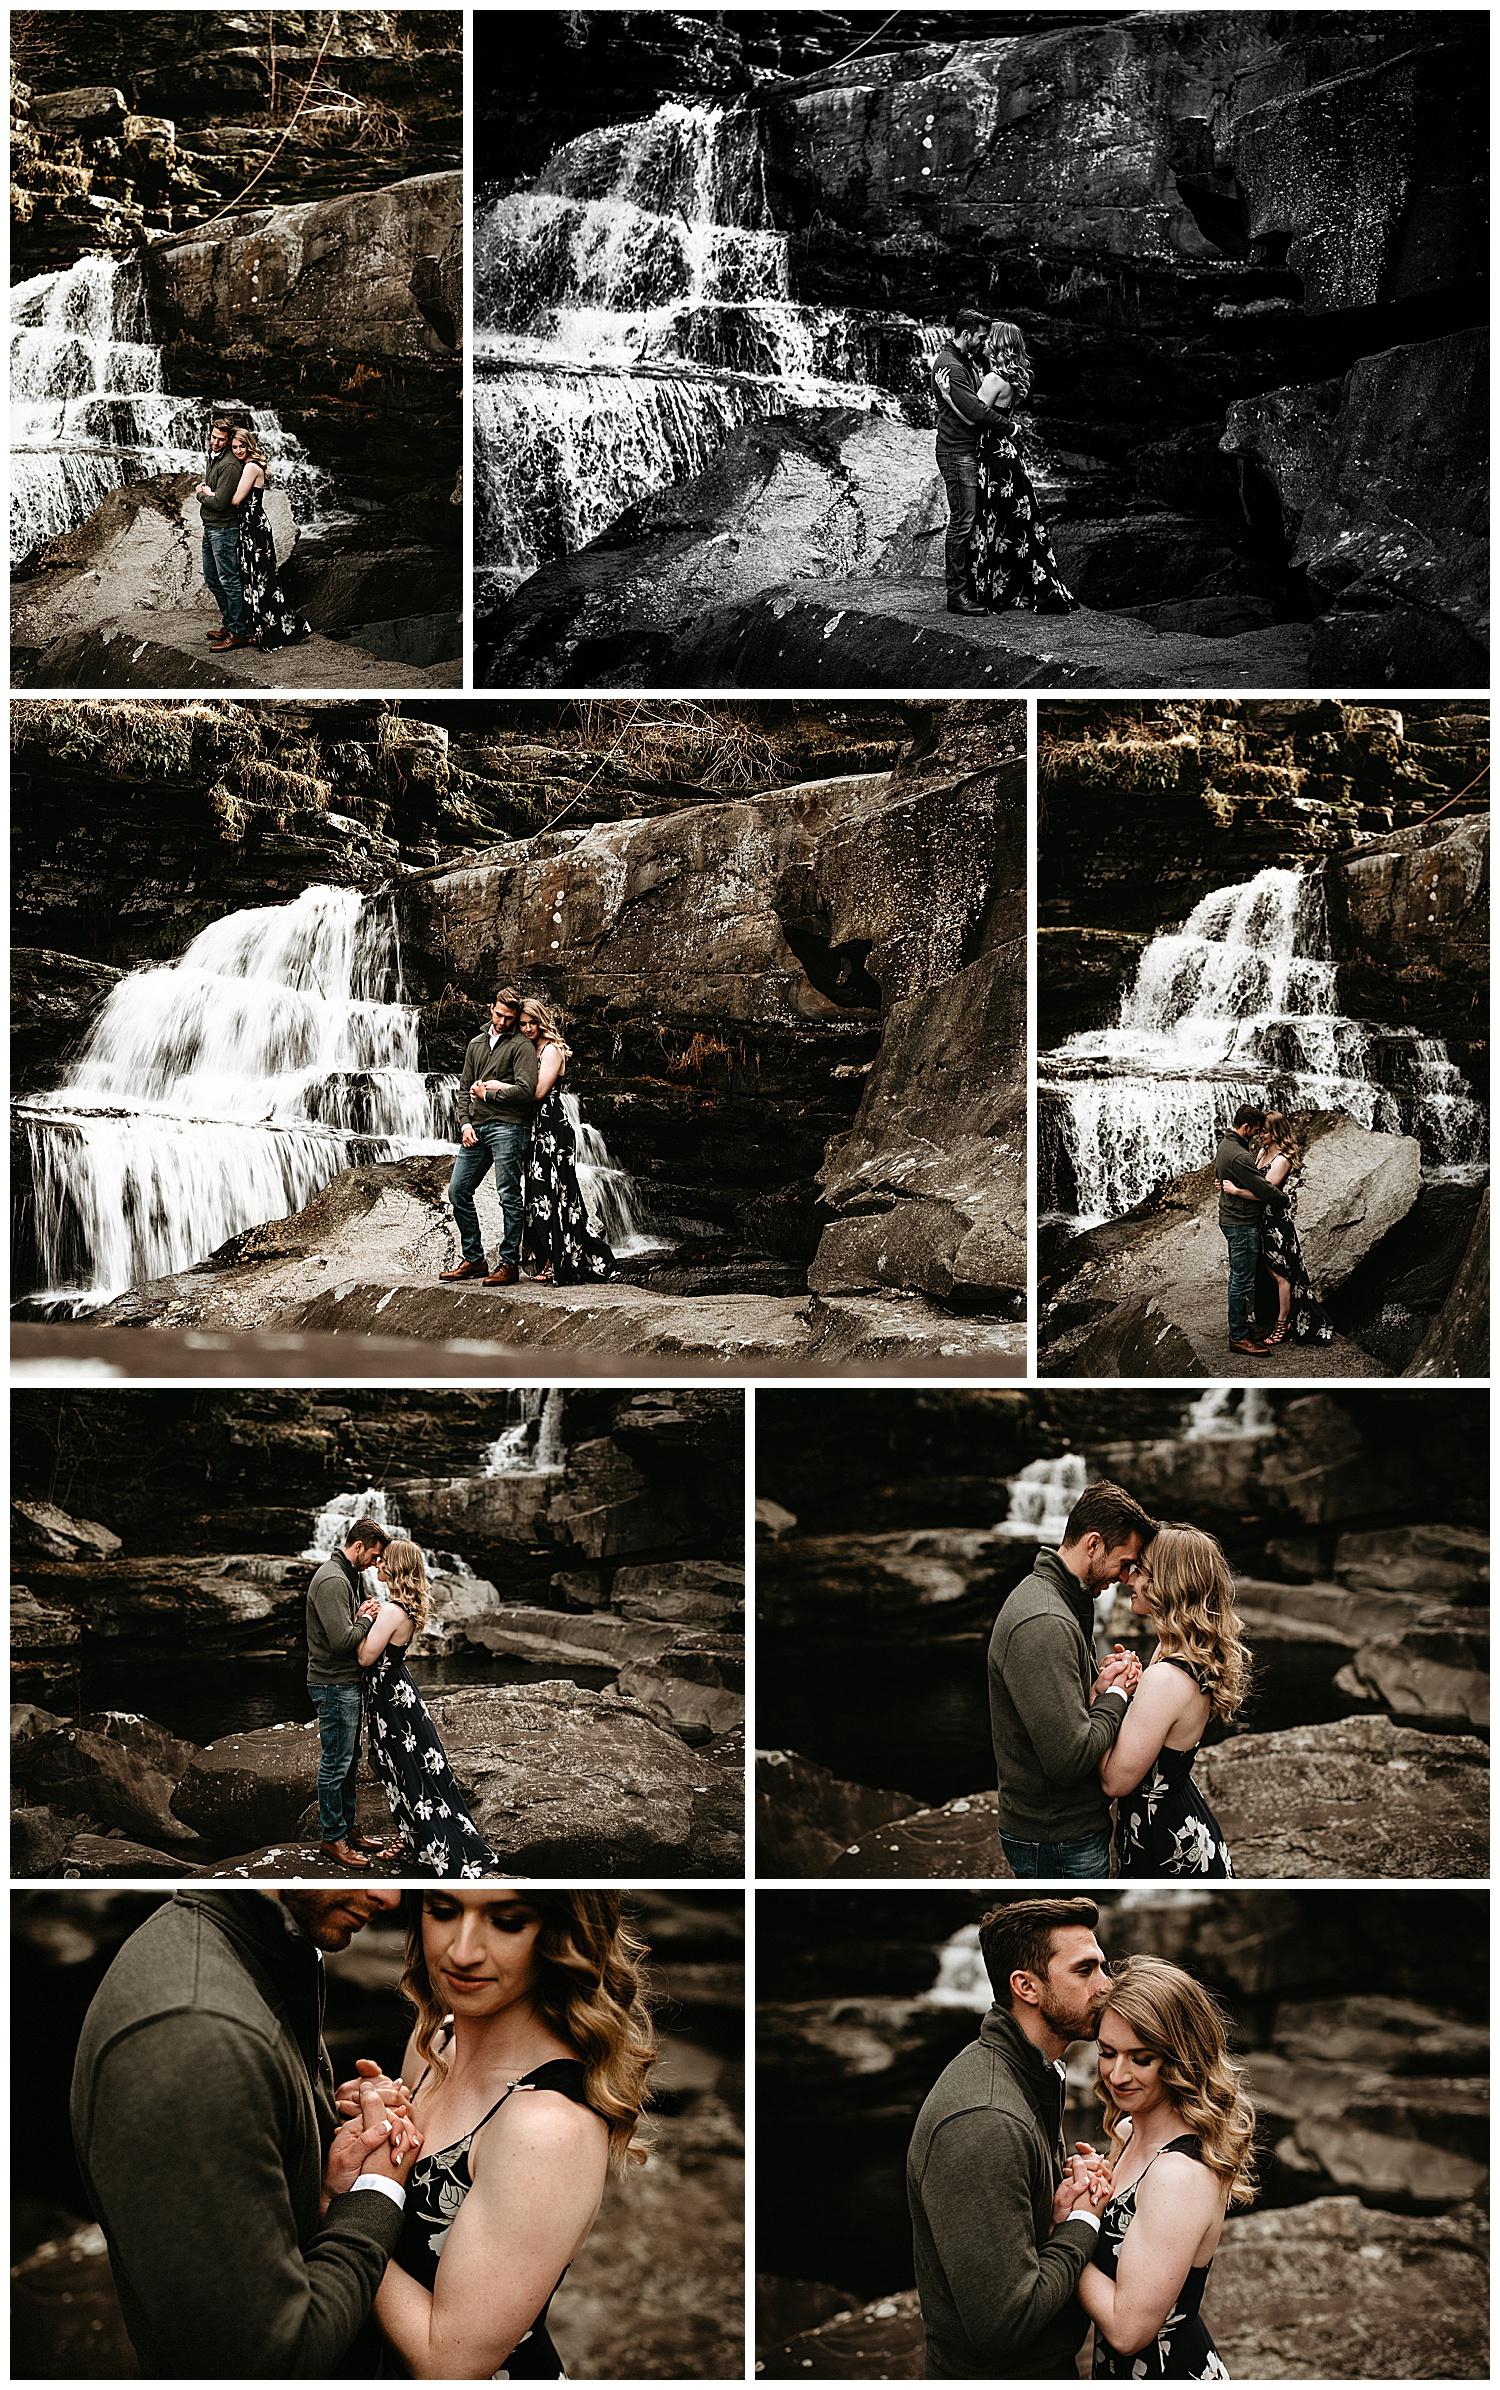 NEPA-Lehigh-Valley-Wedding-Photographer-Ledges-Hotel-Hawley-PA_0008.jpg